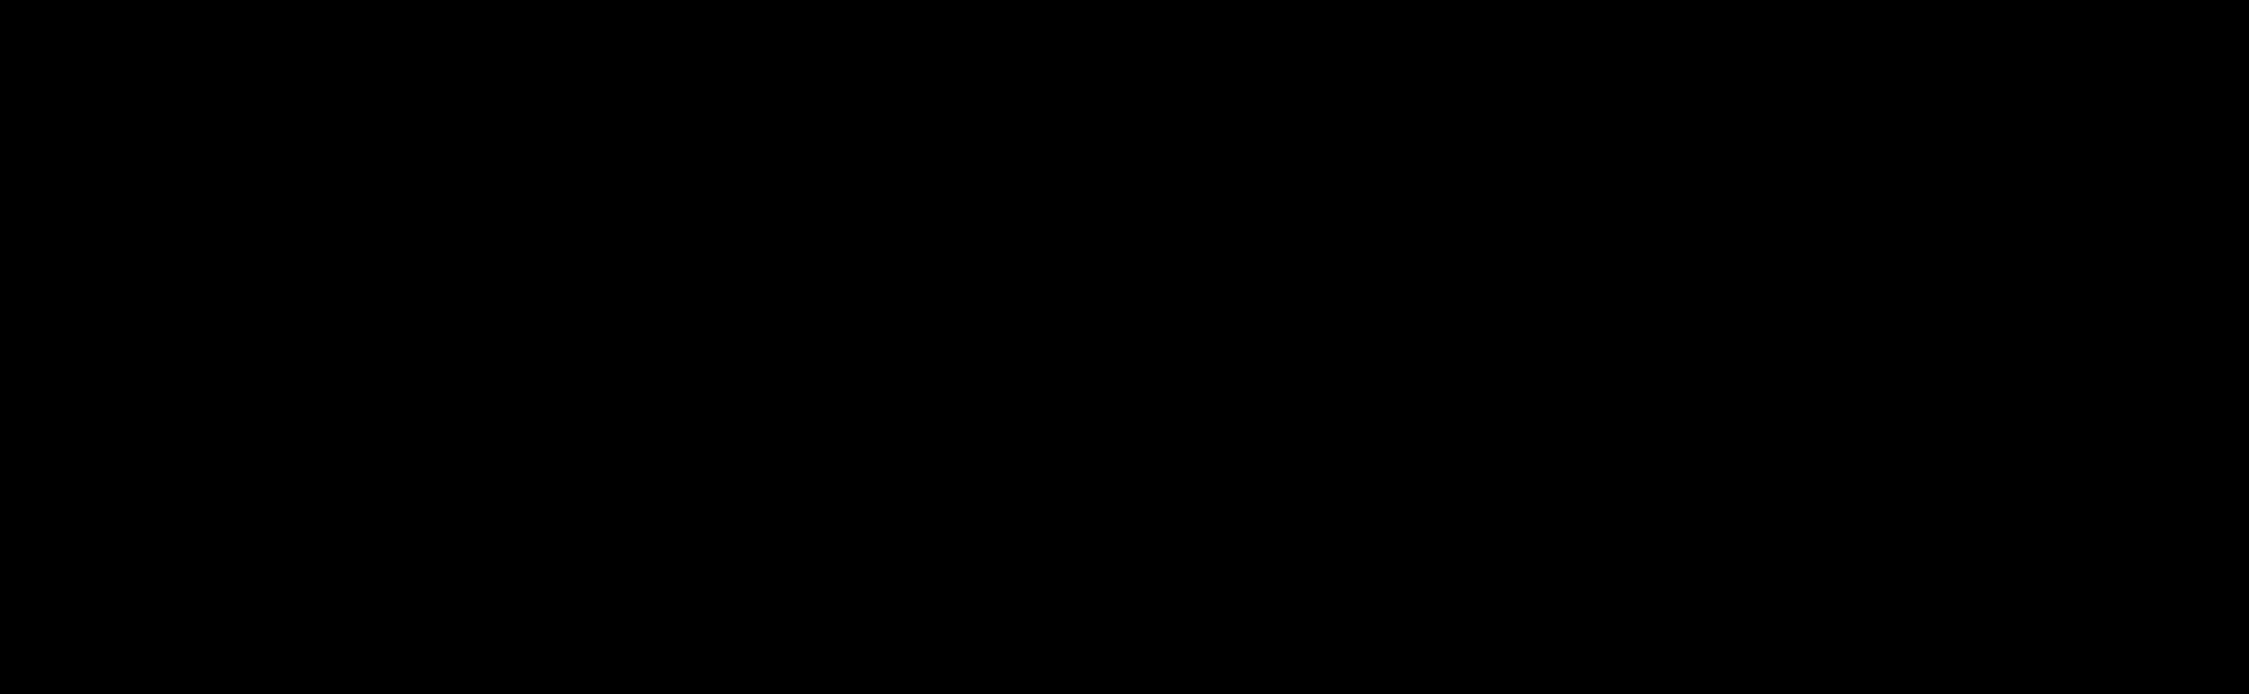 Aqua Lung Military & Professional Logo